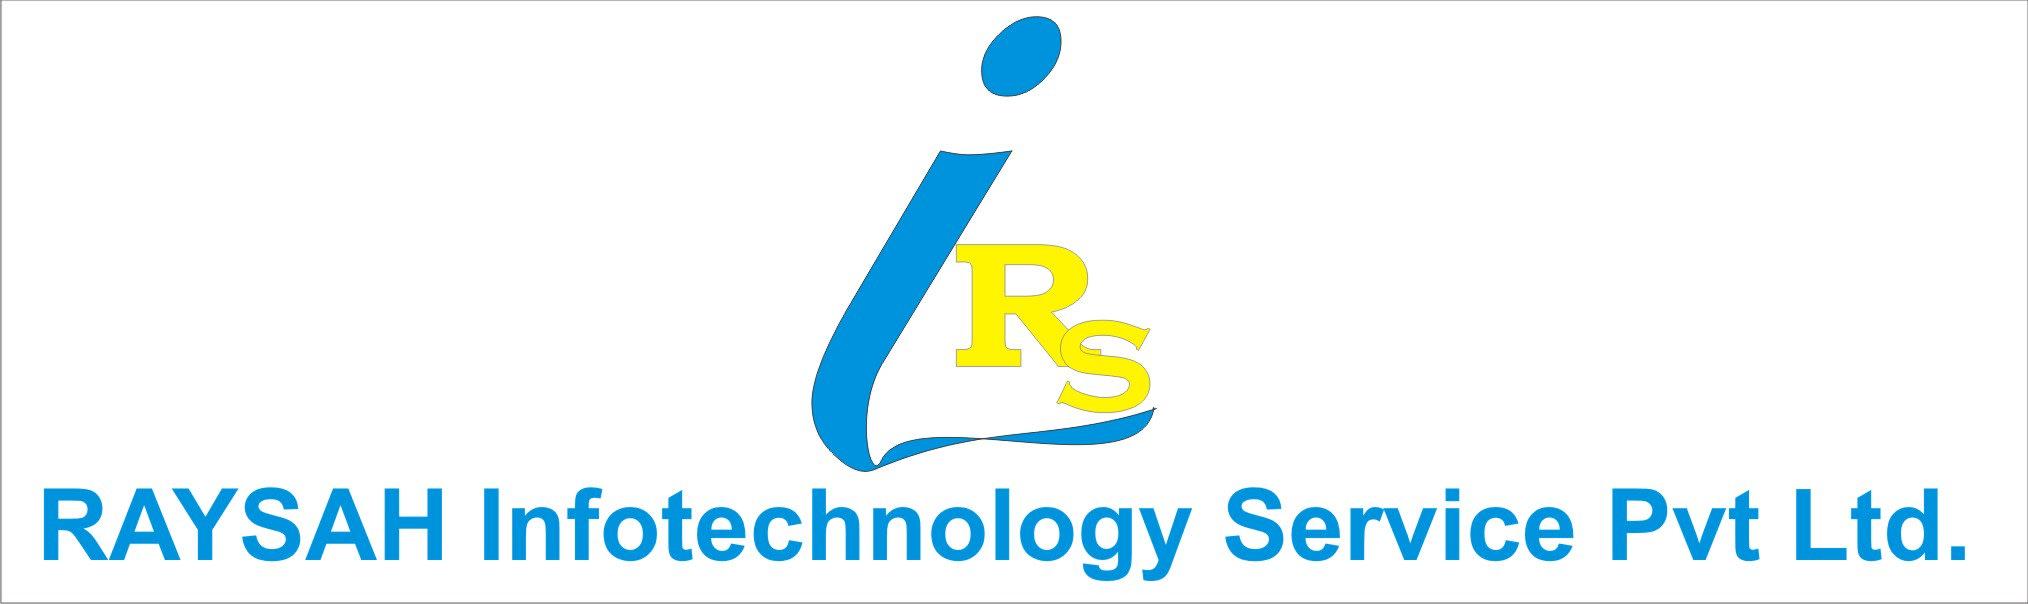 Raysah Infotechnology